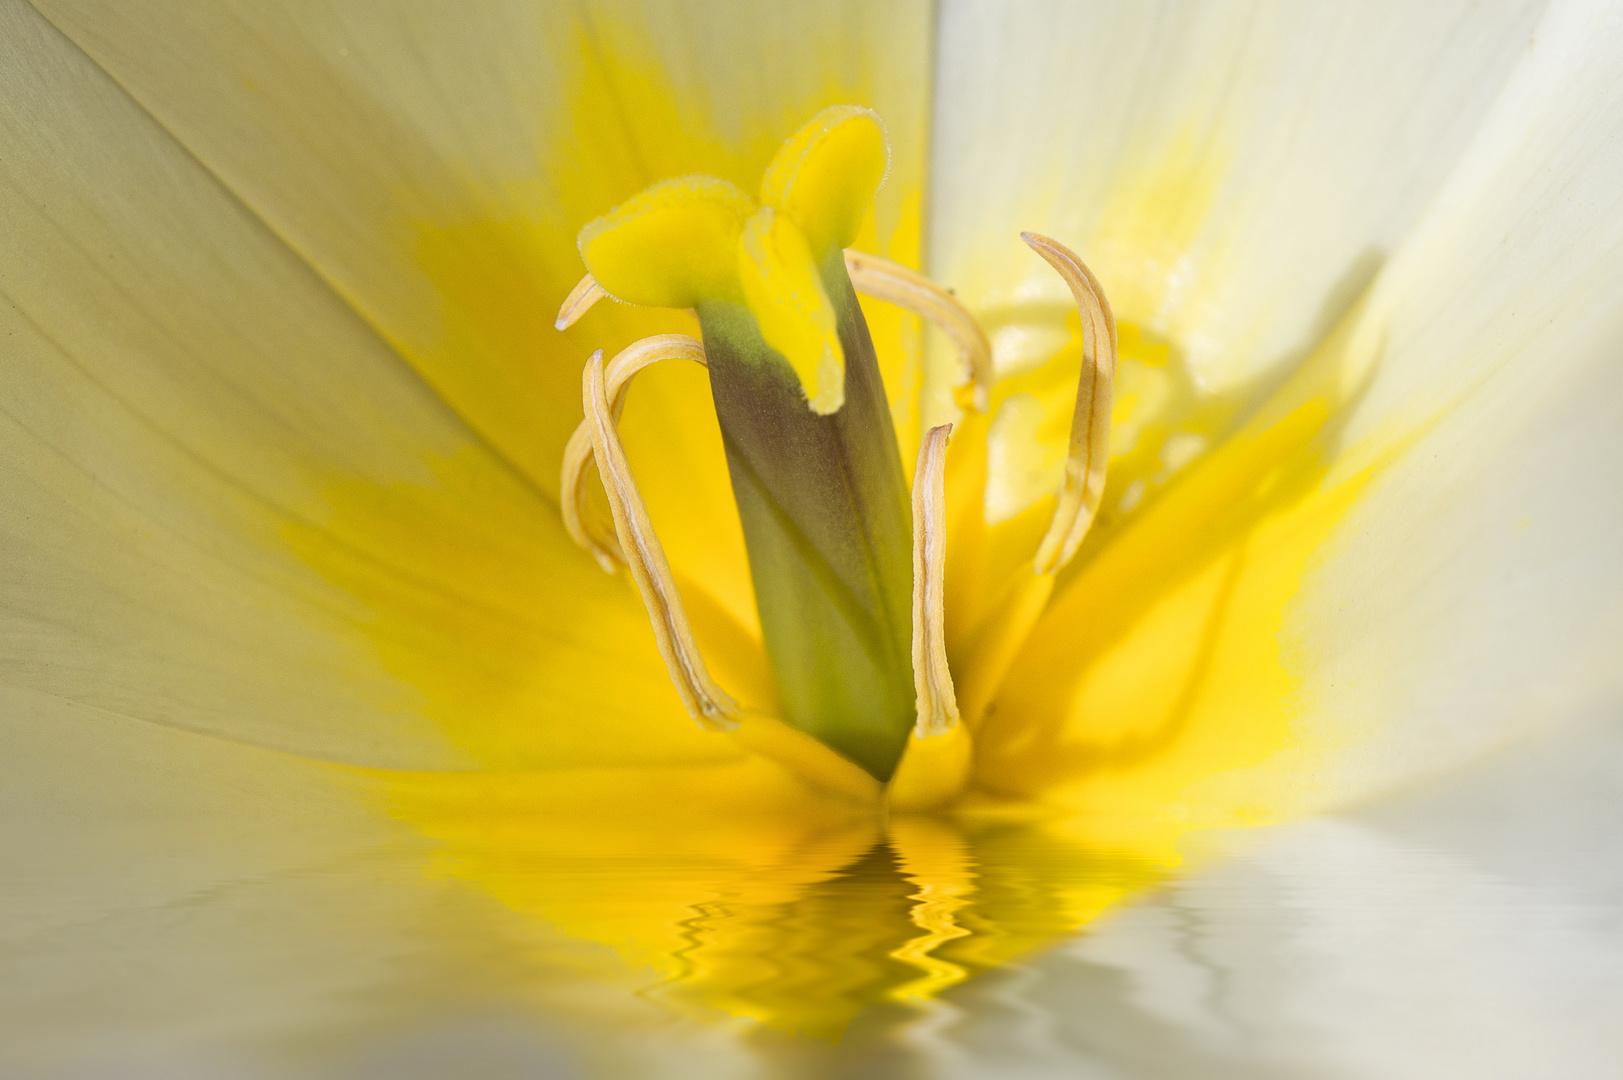 yellow-aqua